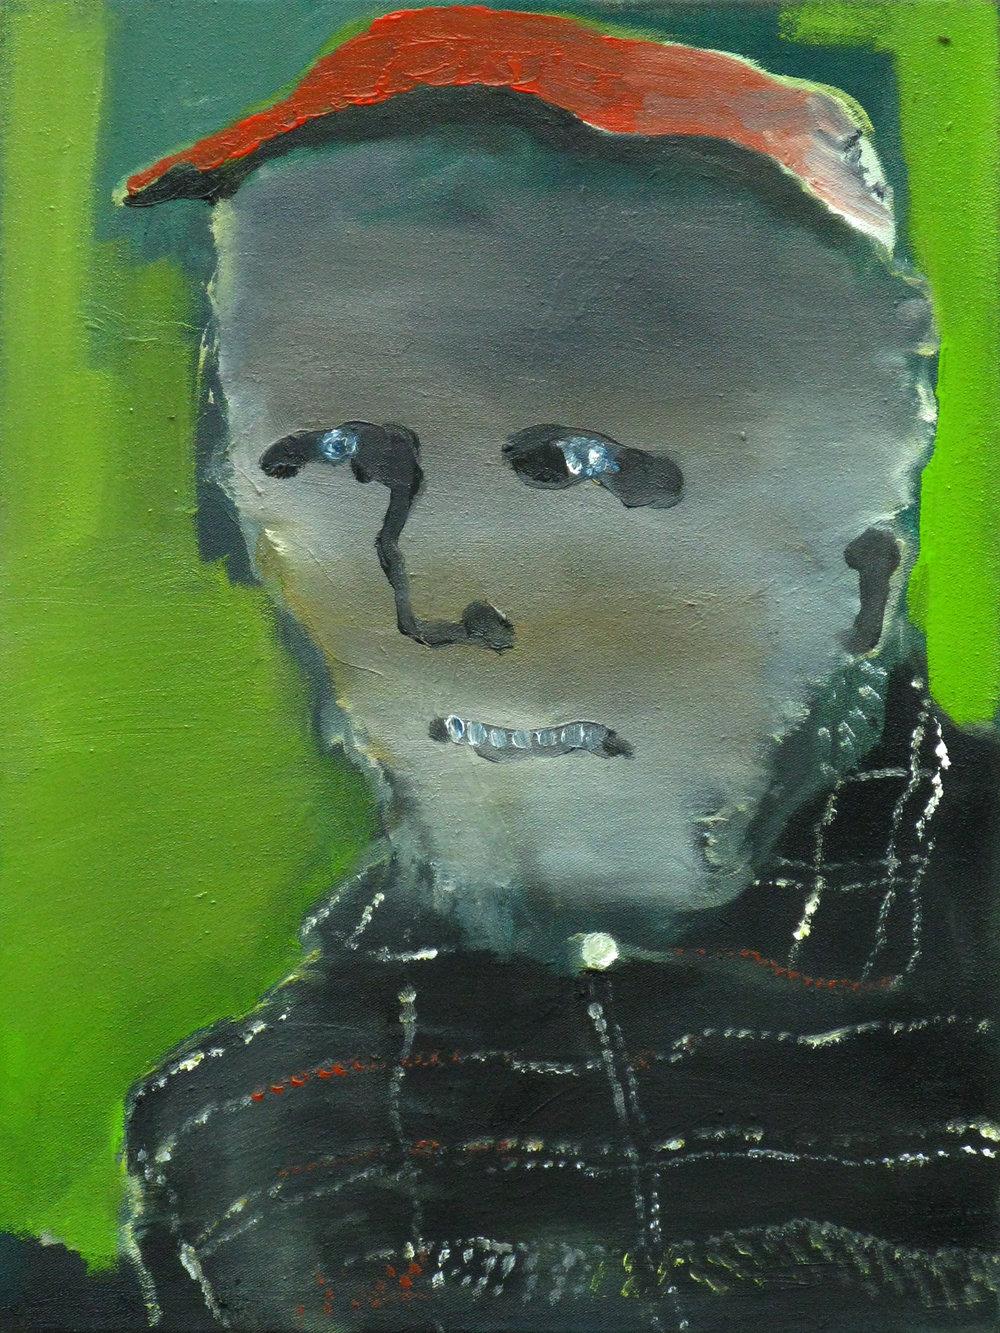 "CHRISTOPH ROßNER   Grinser, oil on canvas, 17.25"" x 13"", 2008"